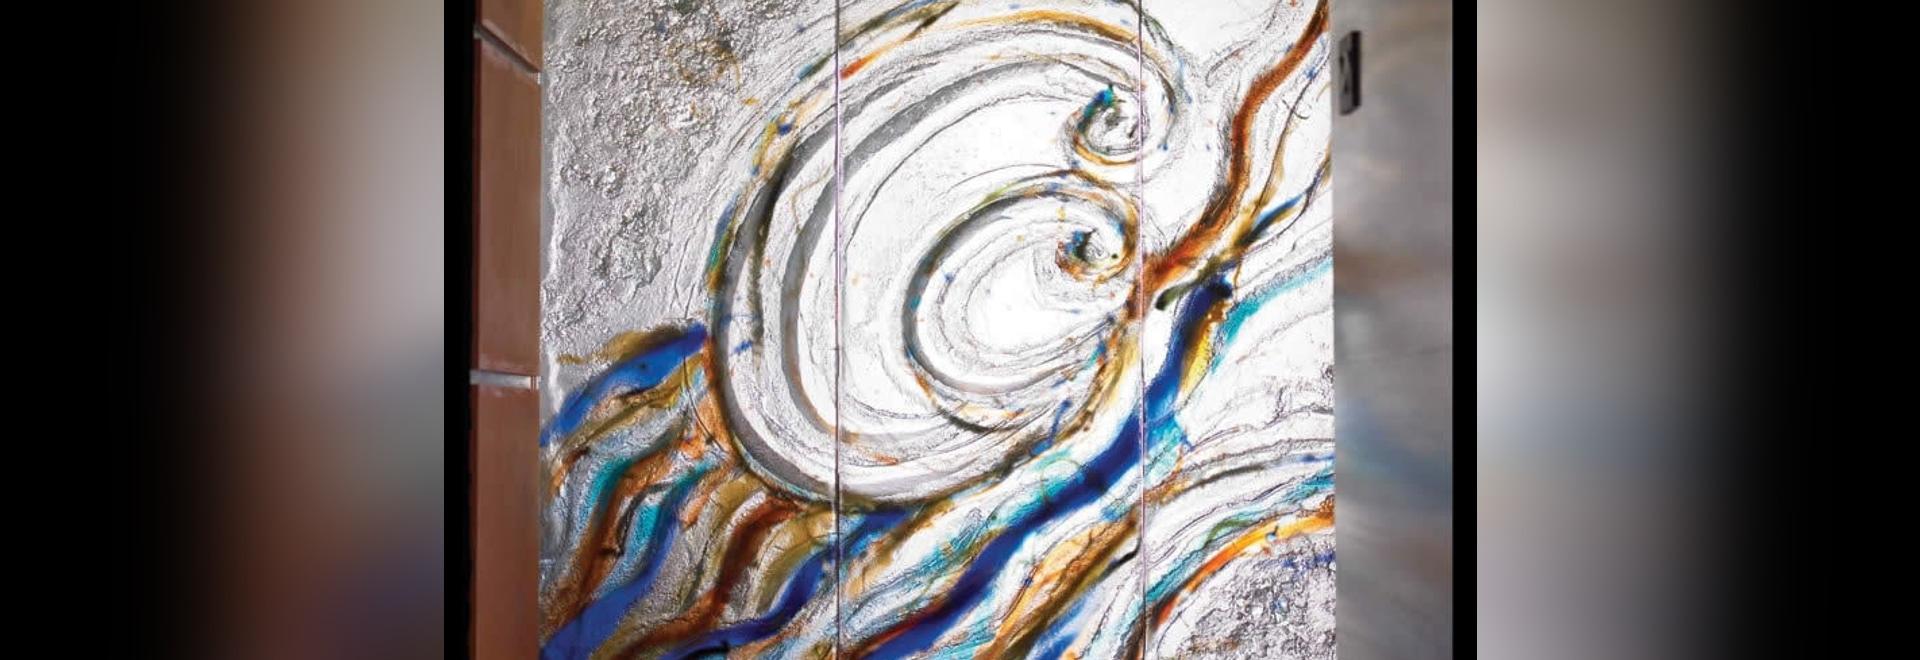 Vetro murale di arte